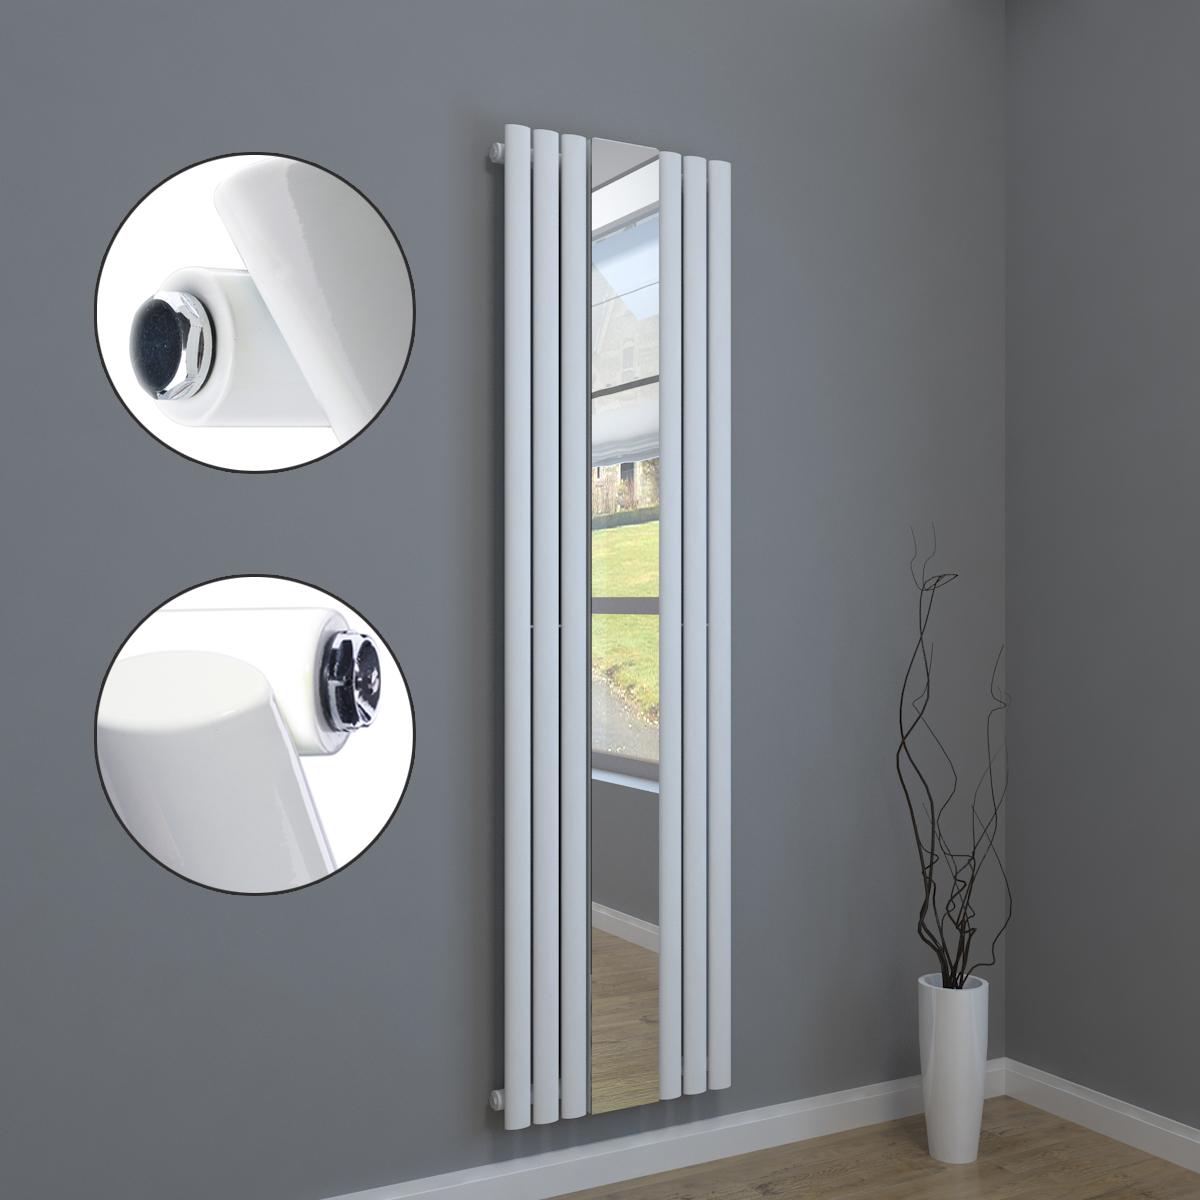 moderne heizk rper anthrazit wei mittelanschluss 500x1800 paneelheizk rper ebay. Black Bedroom Furniture Sets. Home Design Ideas